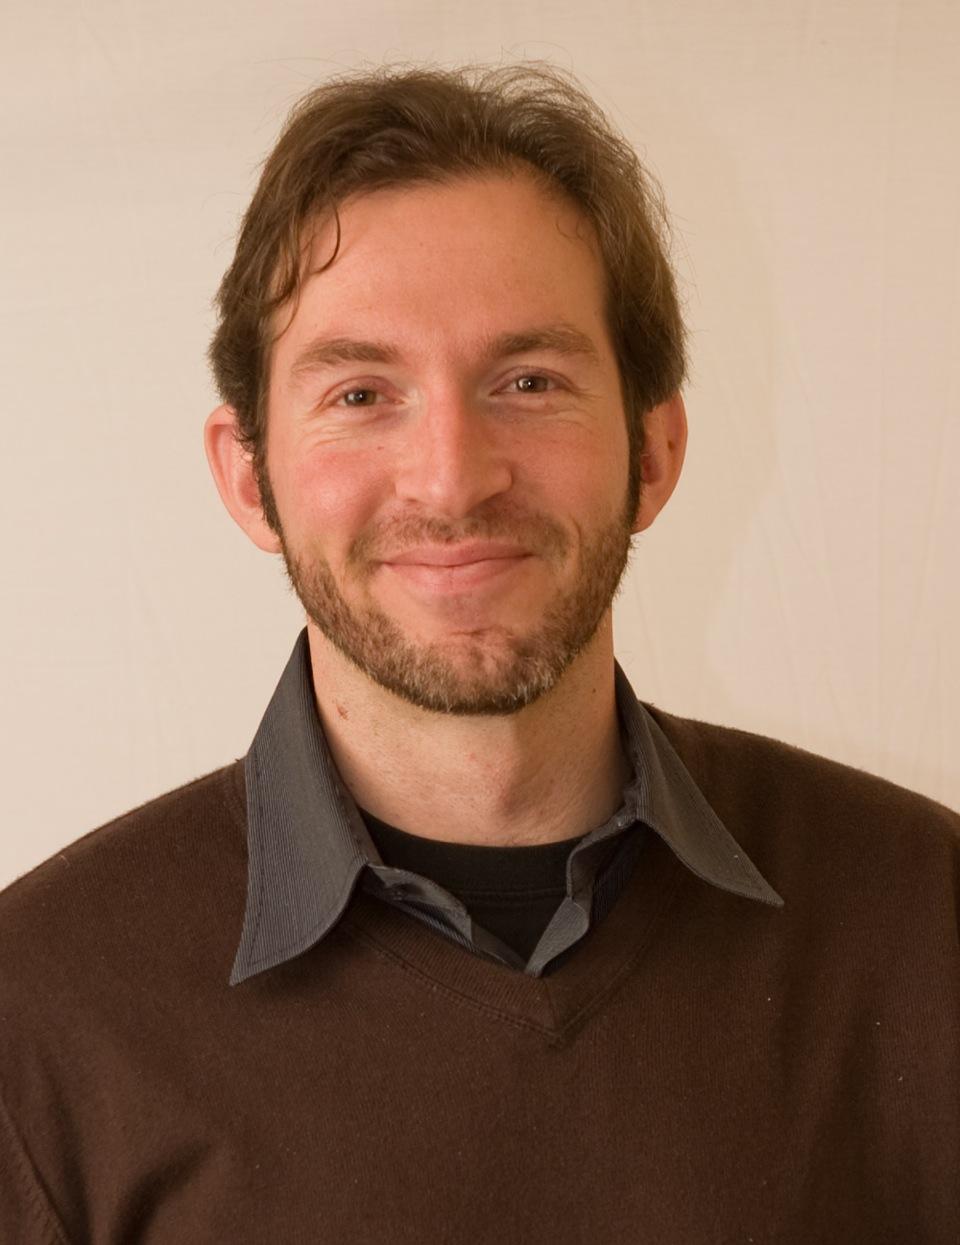 Gleb Budman CEO & Co-Founder, Backblaze